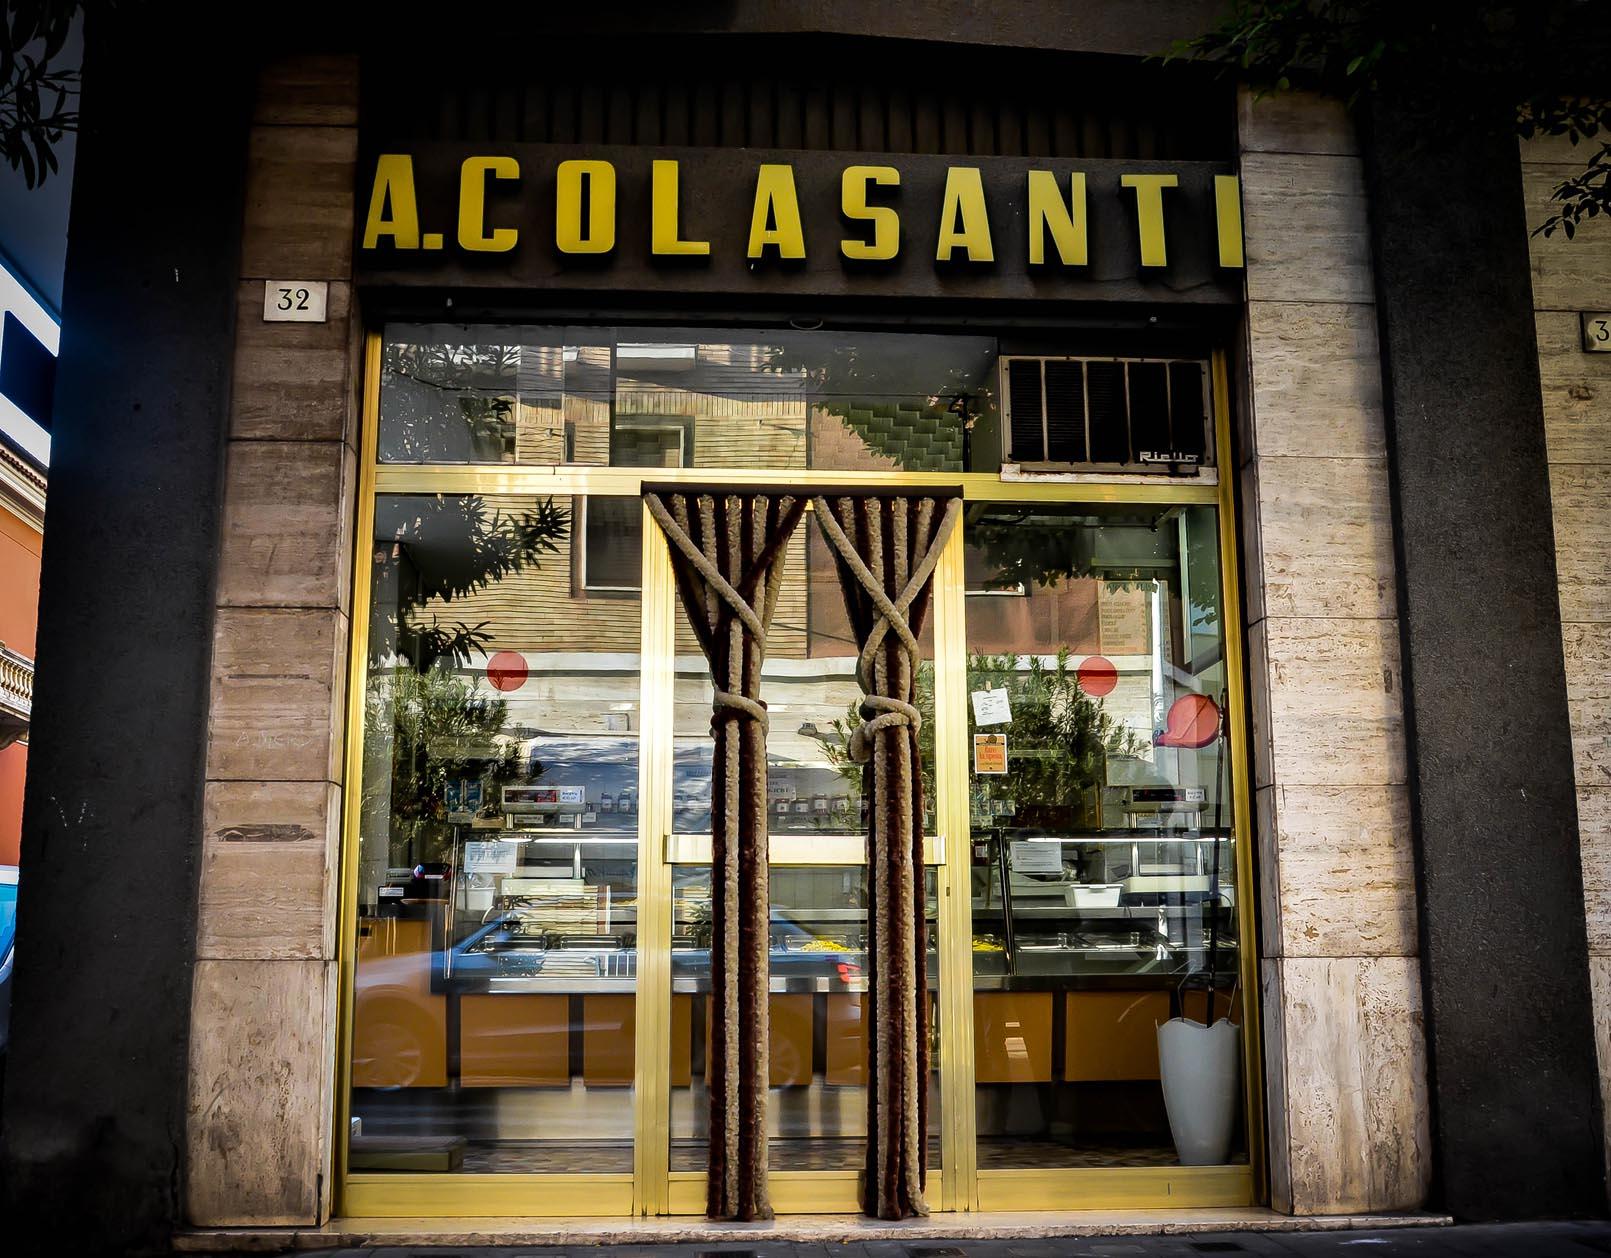 Pastificio Colasanti